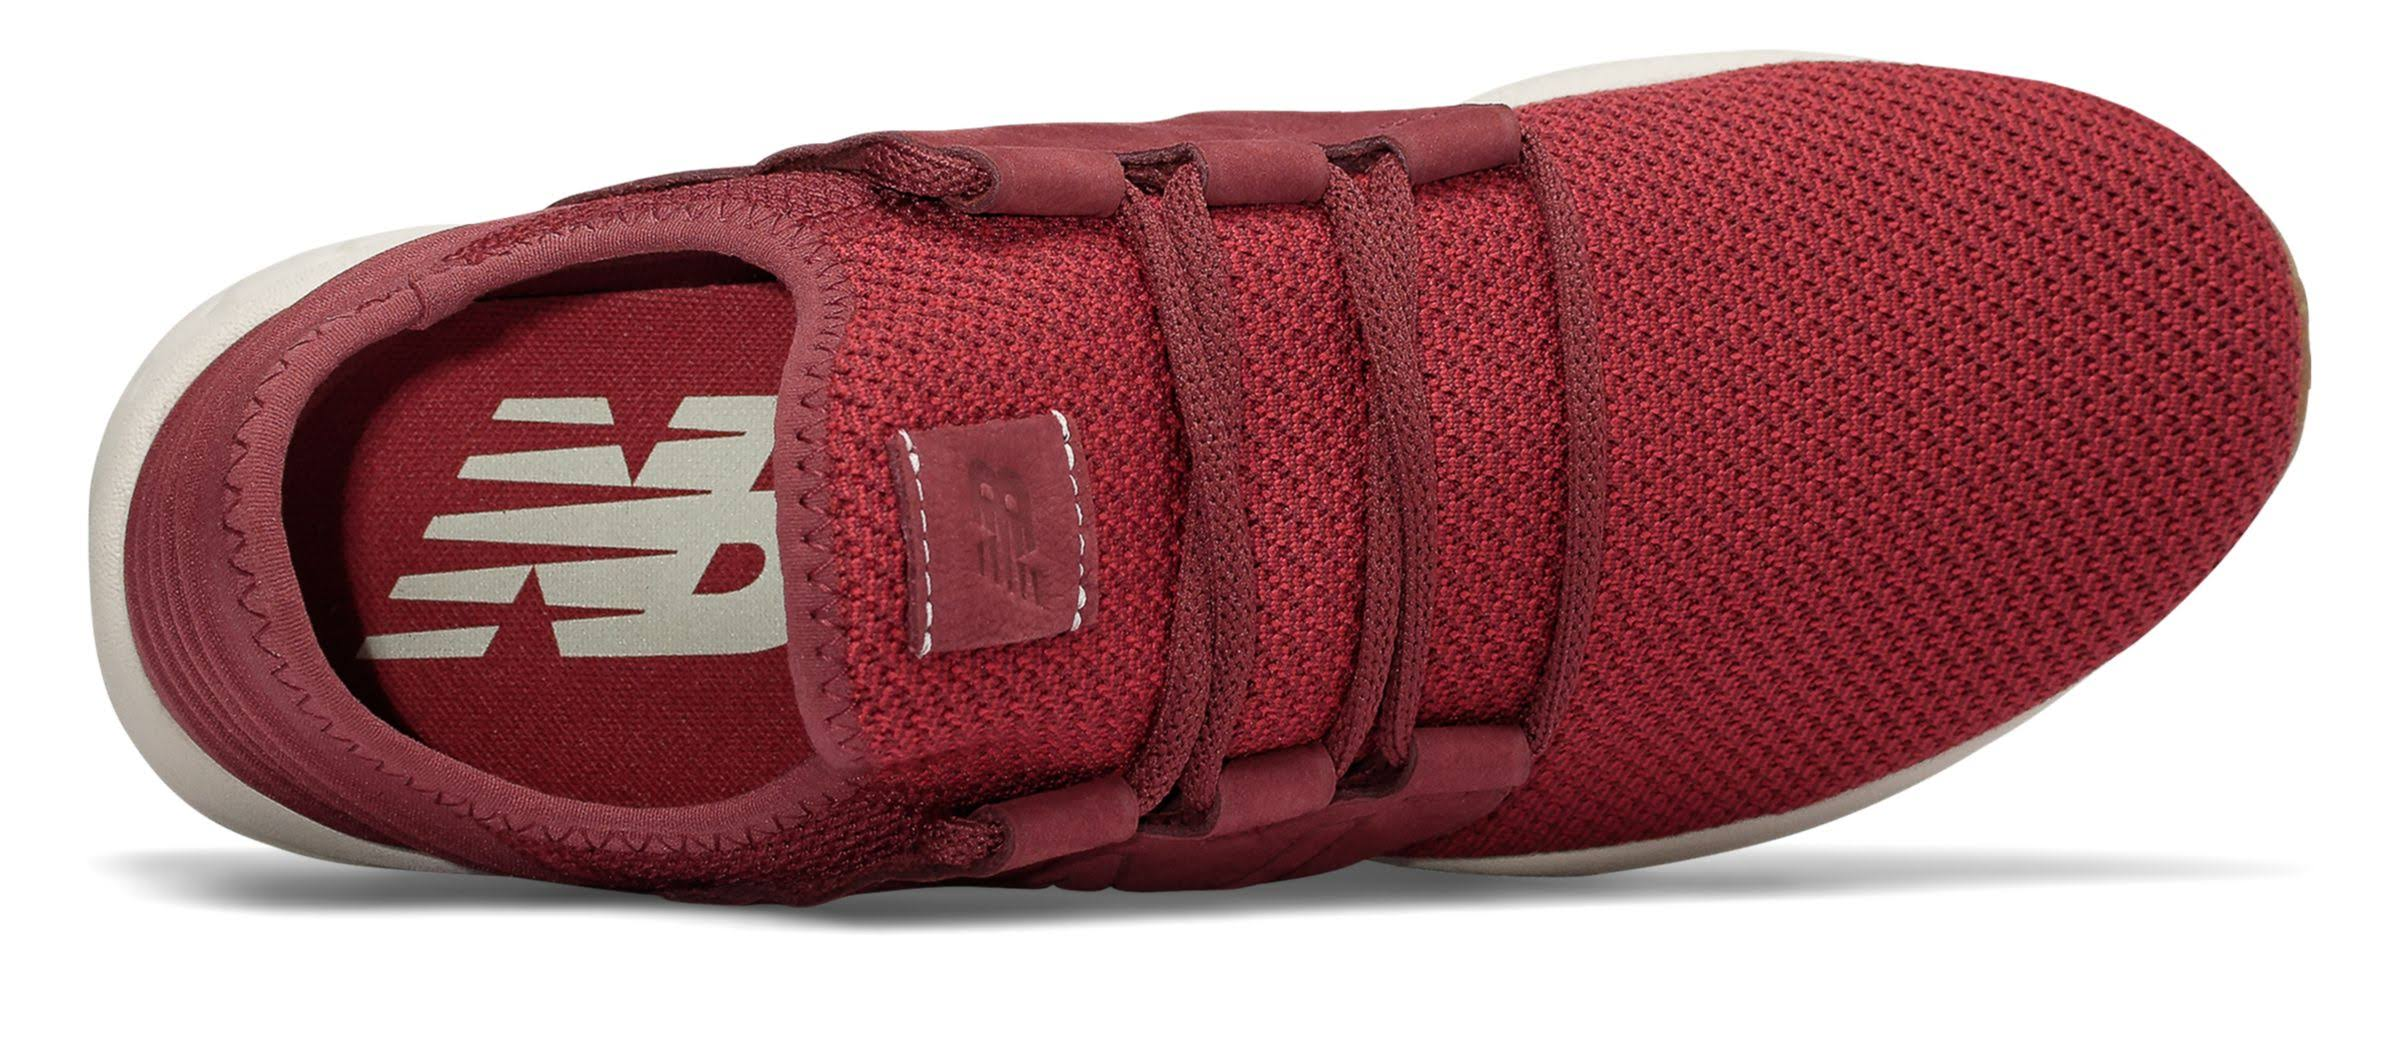 9 Zapatillas De Chile Hombre D Para Running Balance Pepper Rojo Mcruznr2 New Mercury rrnq8dRz